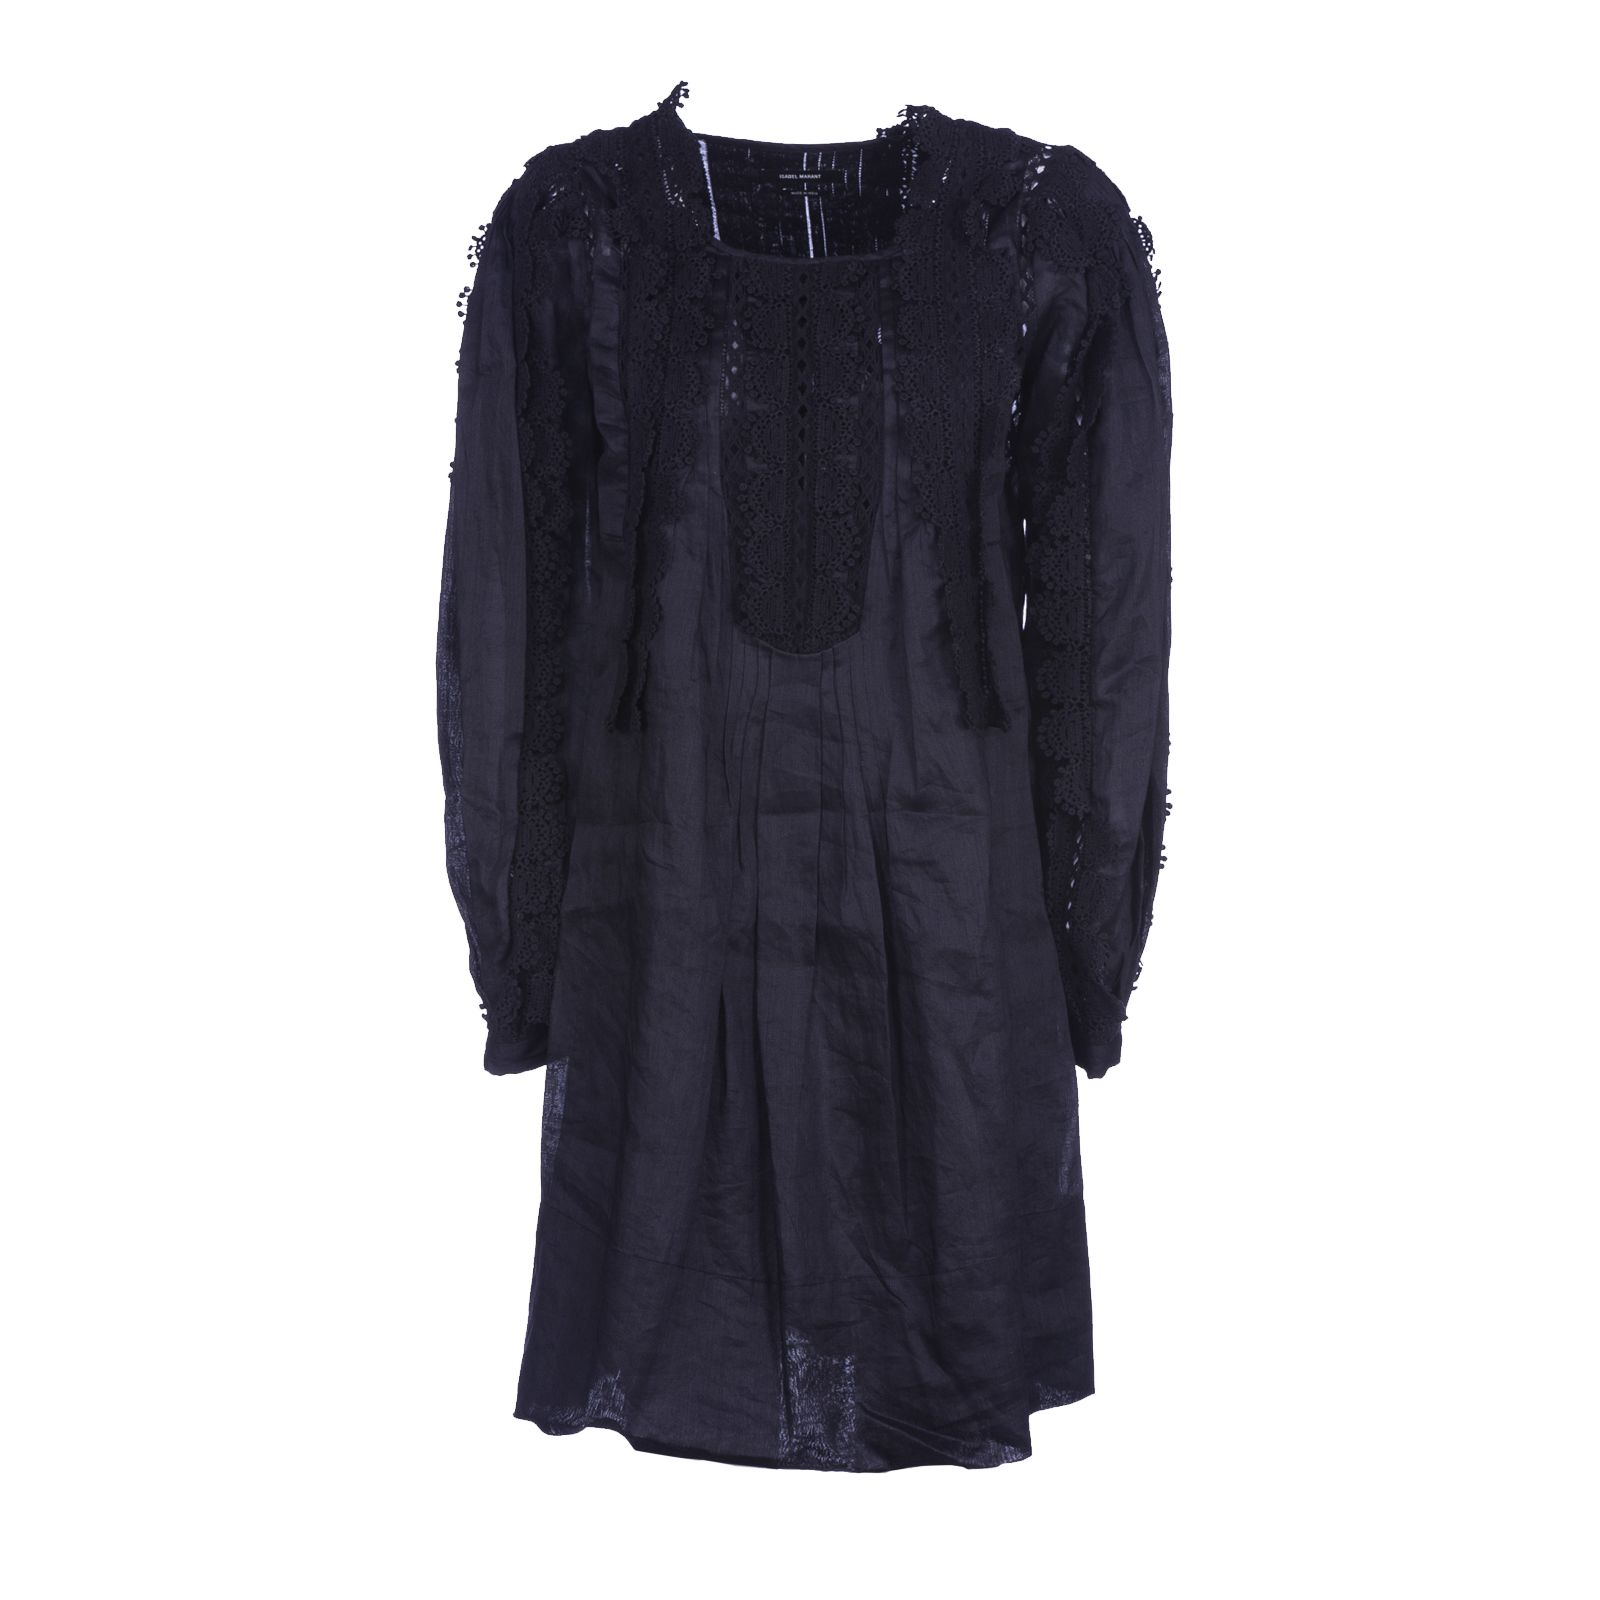 Isabel marant isabel marant lace trim dress black for Isabel marant shirt dress